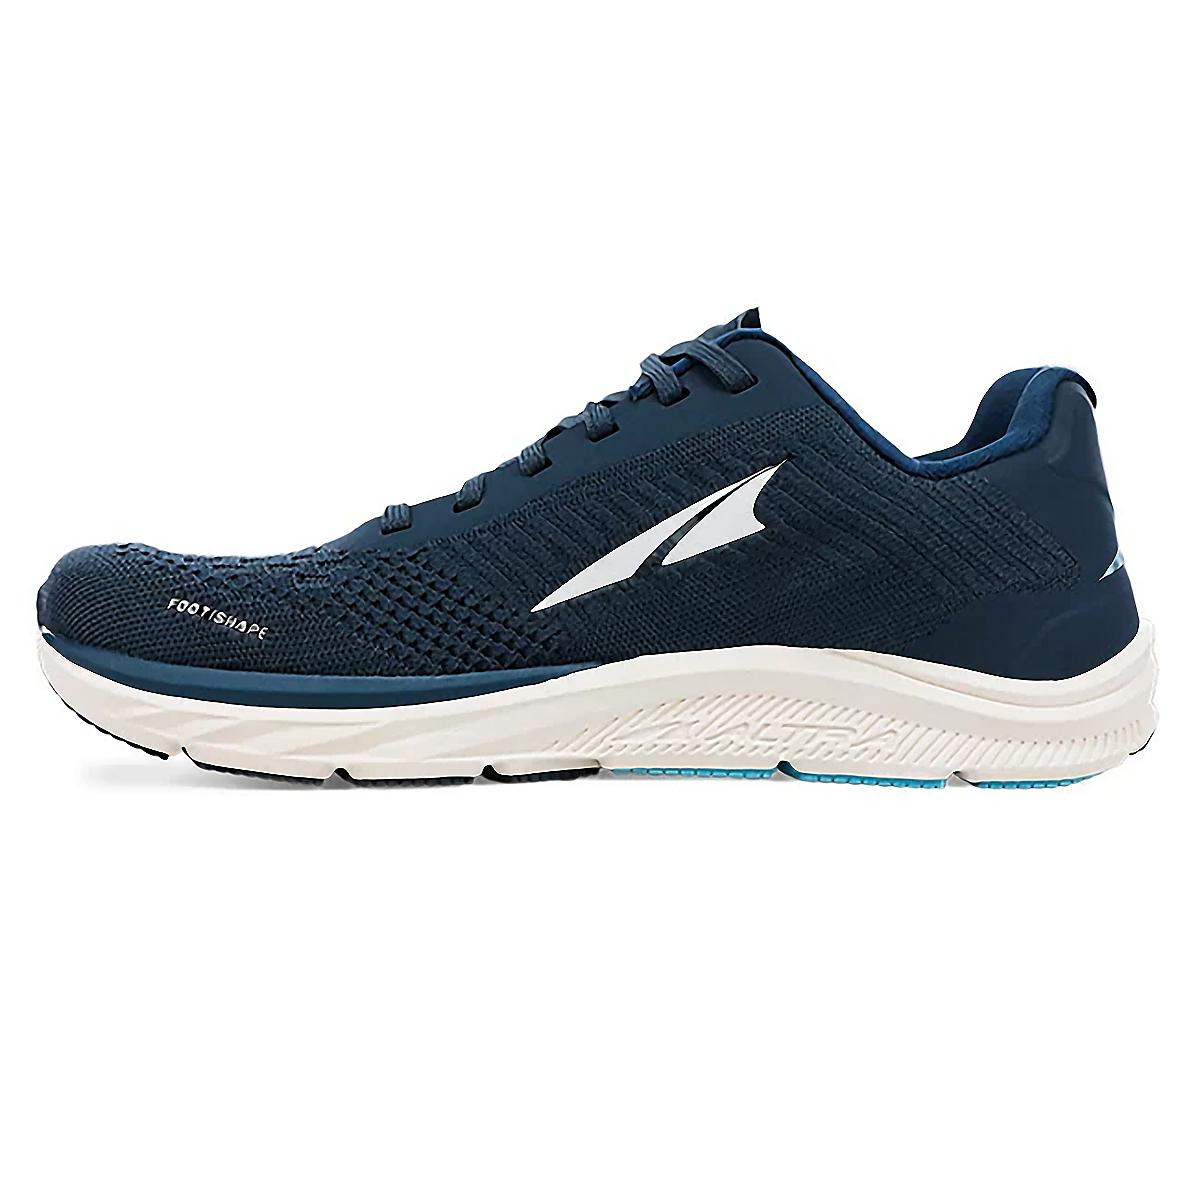 Men's Altra Torin 4.5 Plush Running Shoe - Color: Majolica Blue - Size: 7 - Width: Regular, Majolica Blue, large, image 2